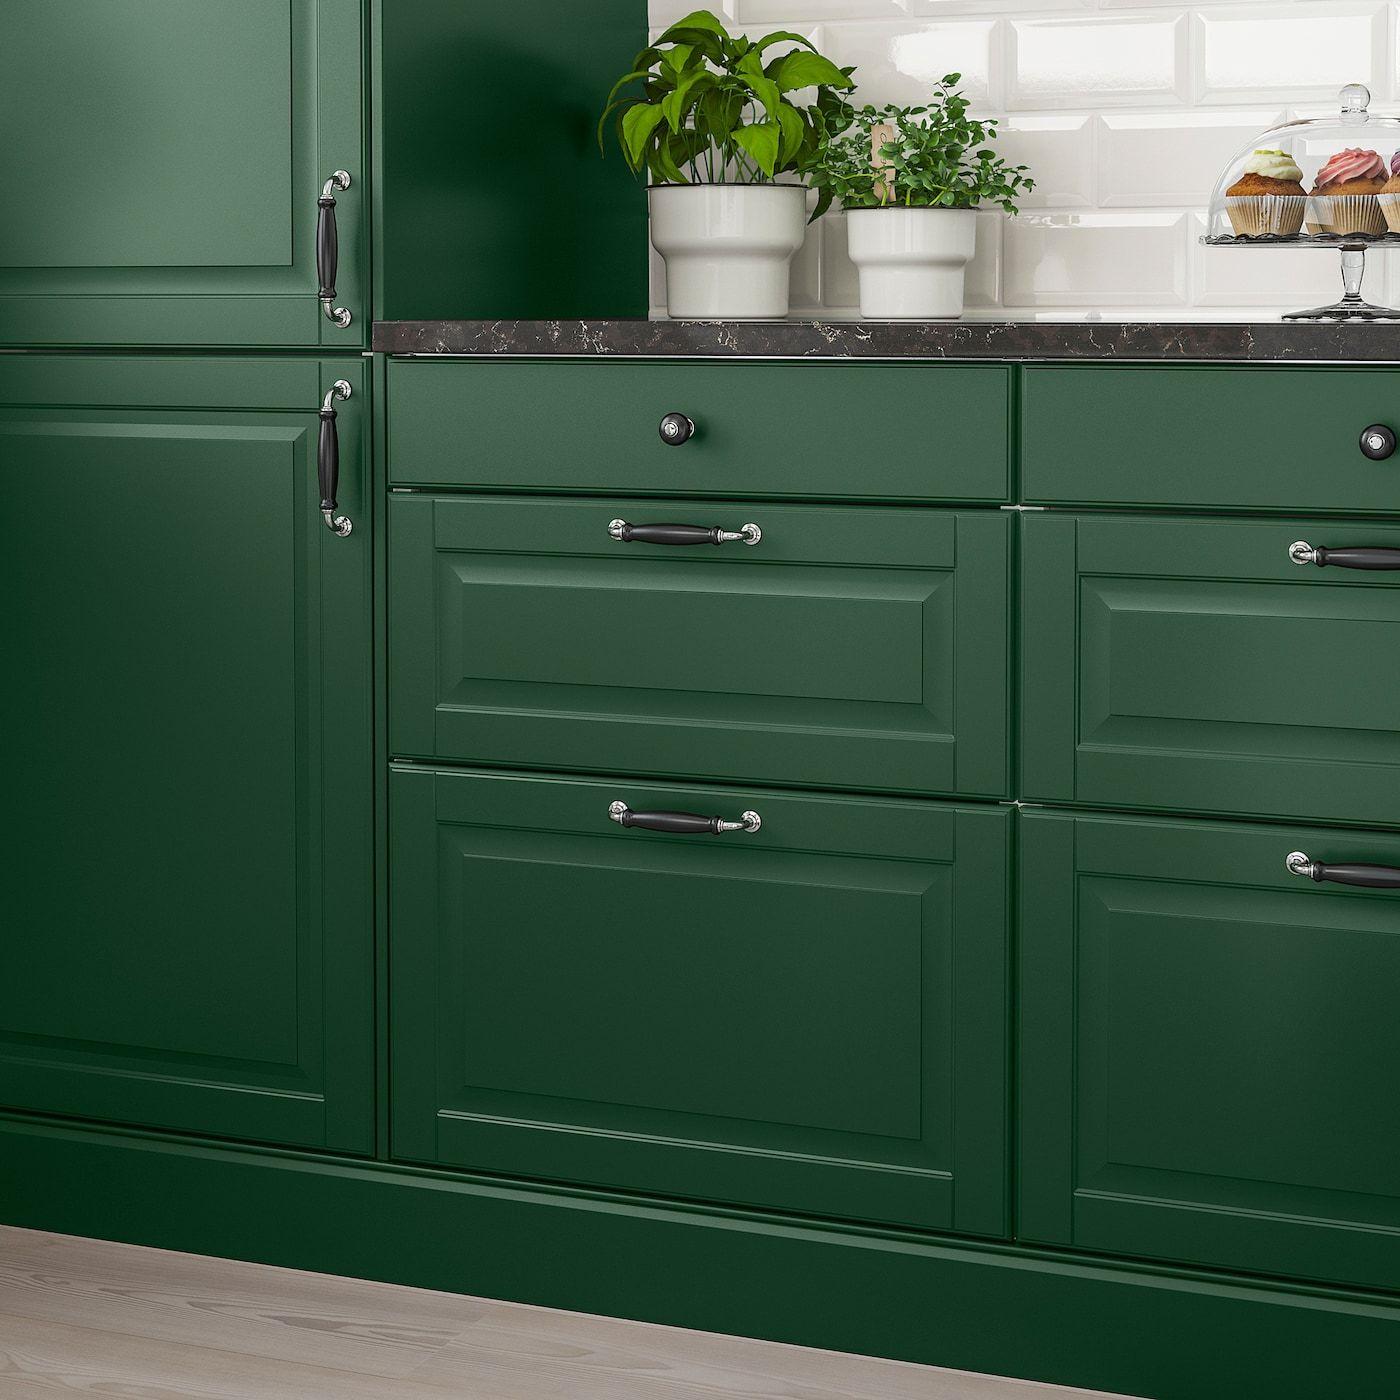 Bodbyn Drawer Front Dark Green Ikea In 2020 Dark Green Kitchen Green Kitchen Cabinets Green Kitchen